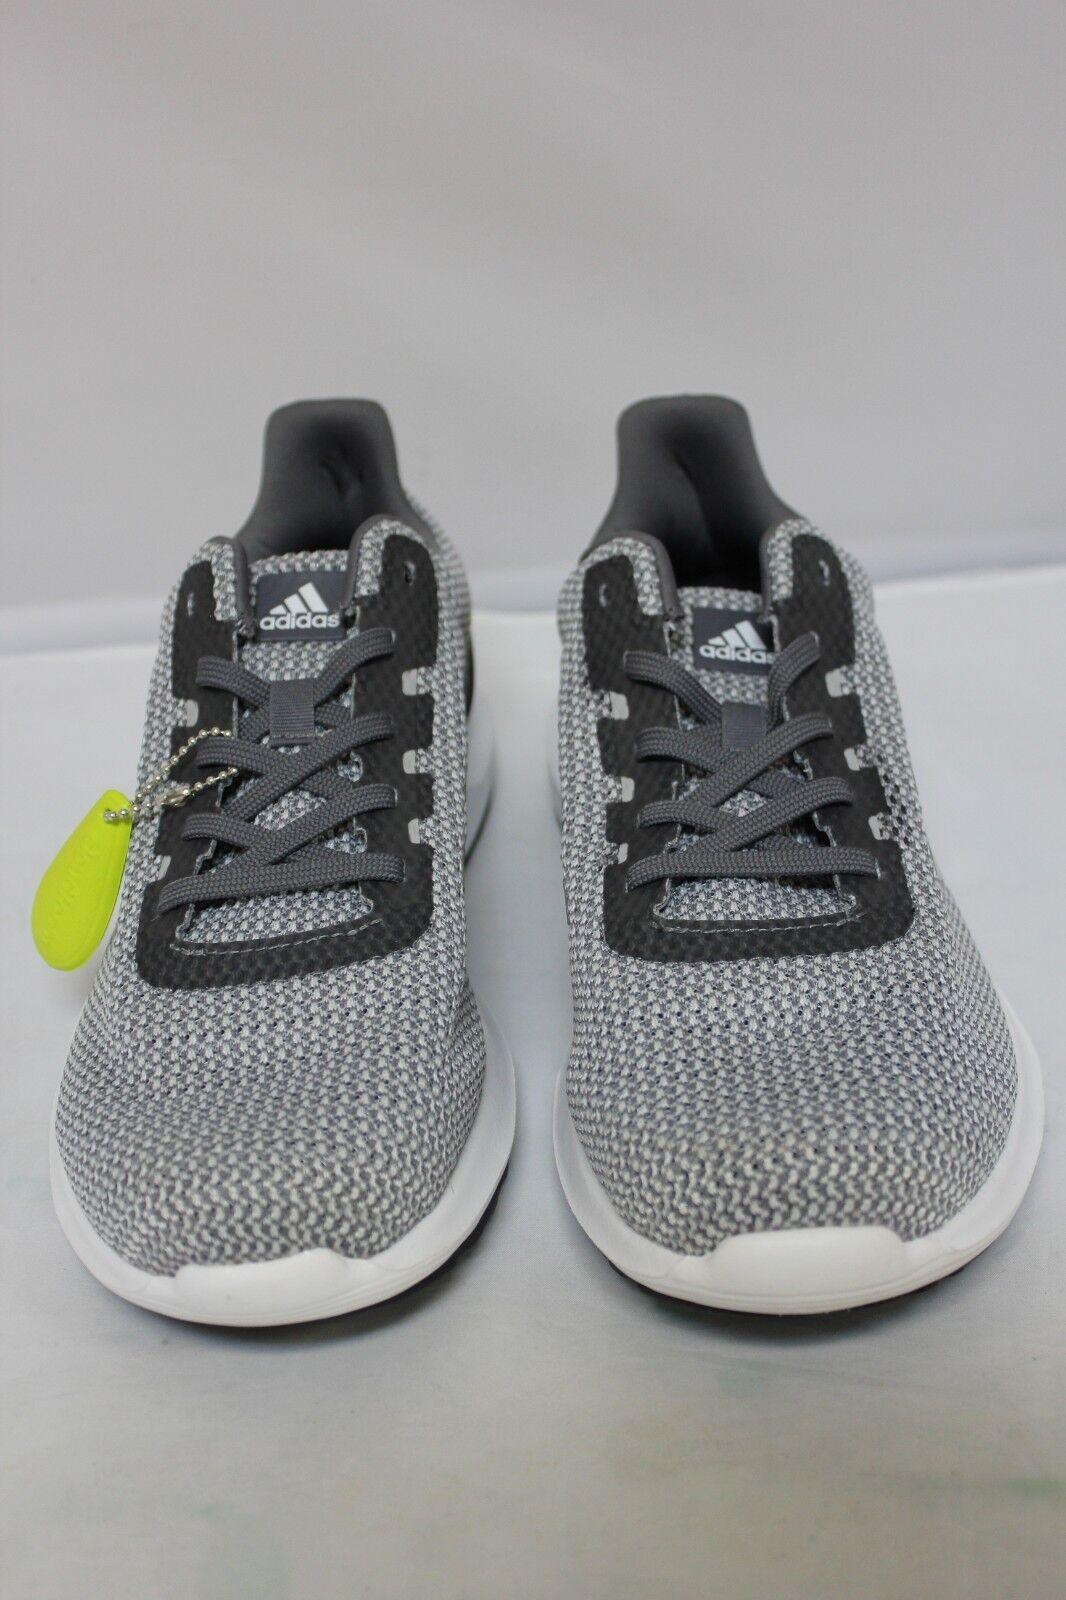 Adidas Cosmic 2 Women's Size 9.5